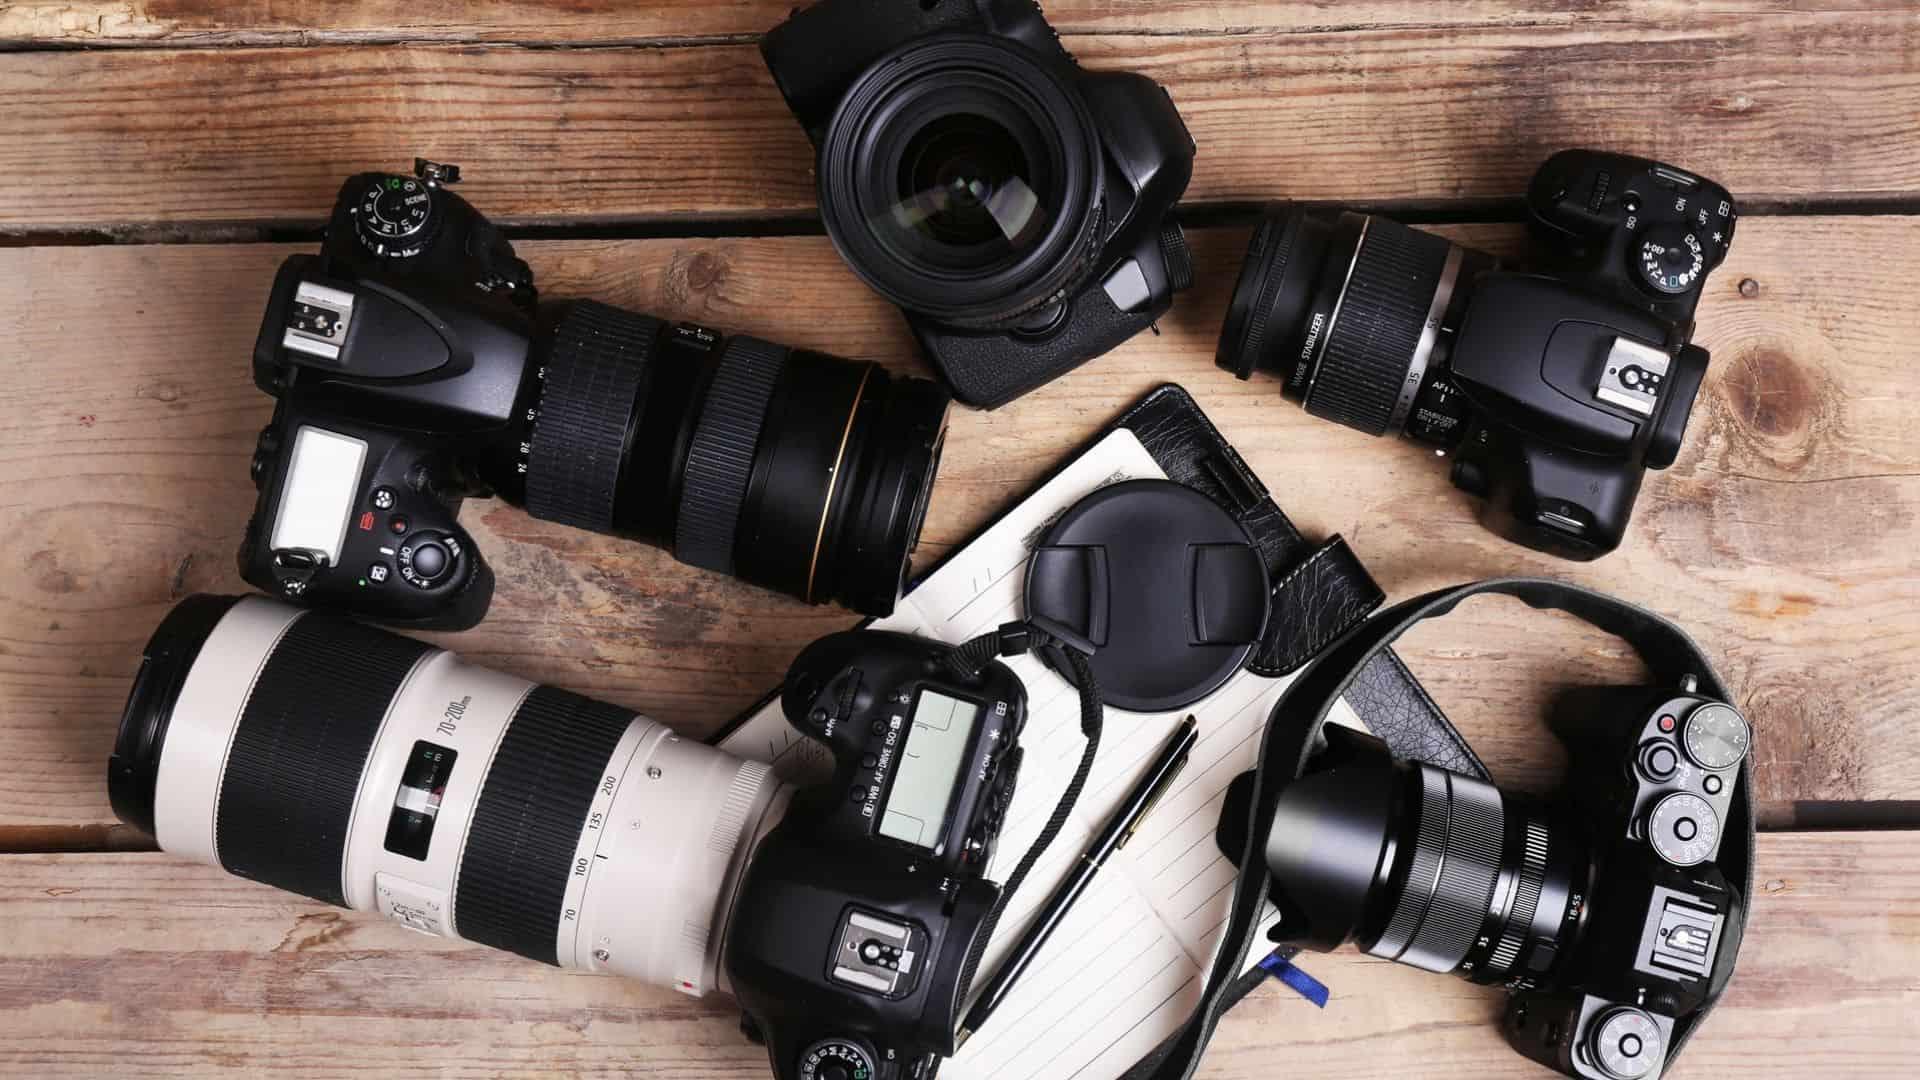 Nikon Z6 Vs. Sony A7III